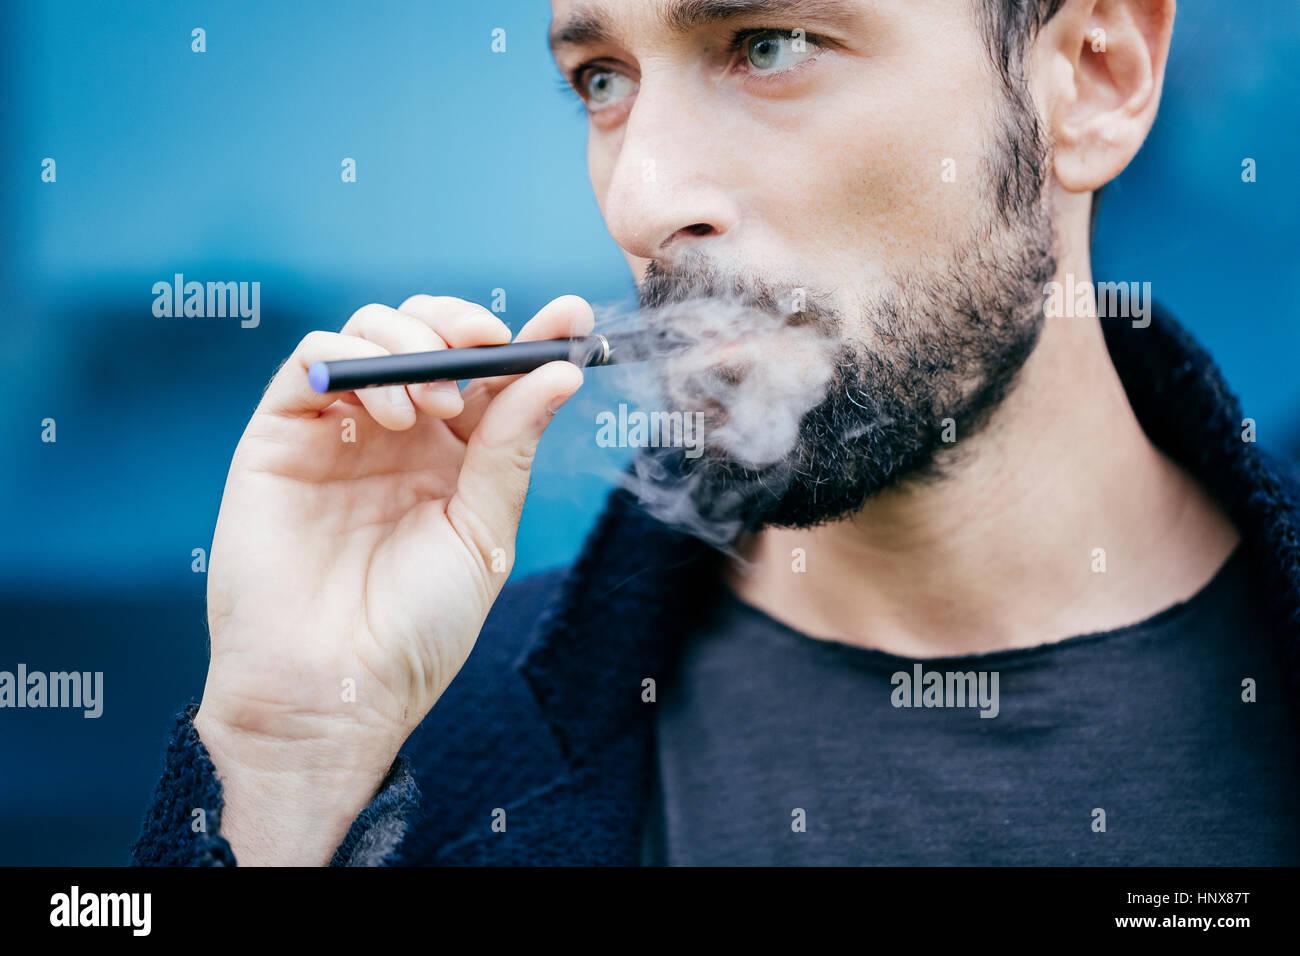 Portrait of man smoking an electronic cigarette - Stock Image